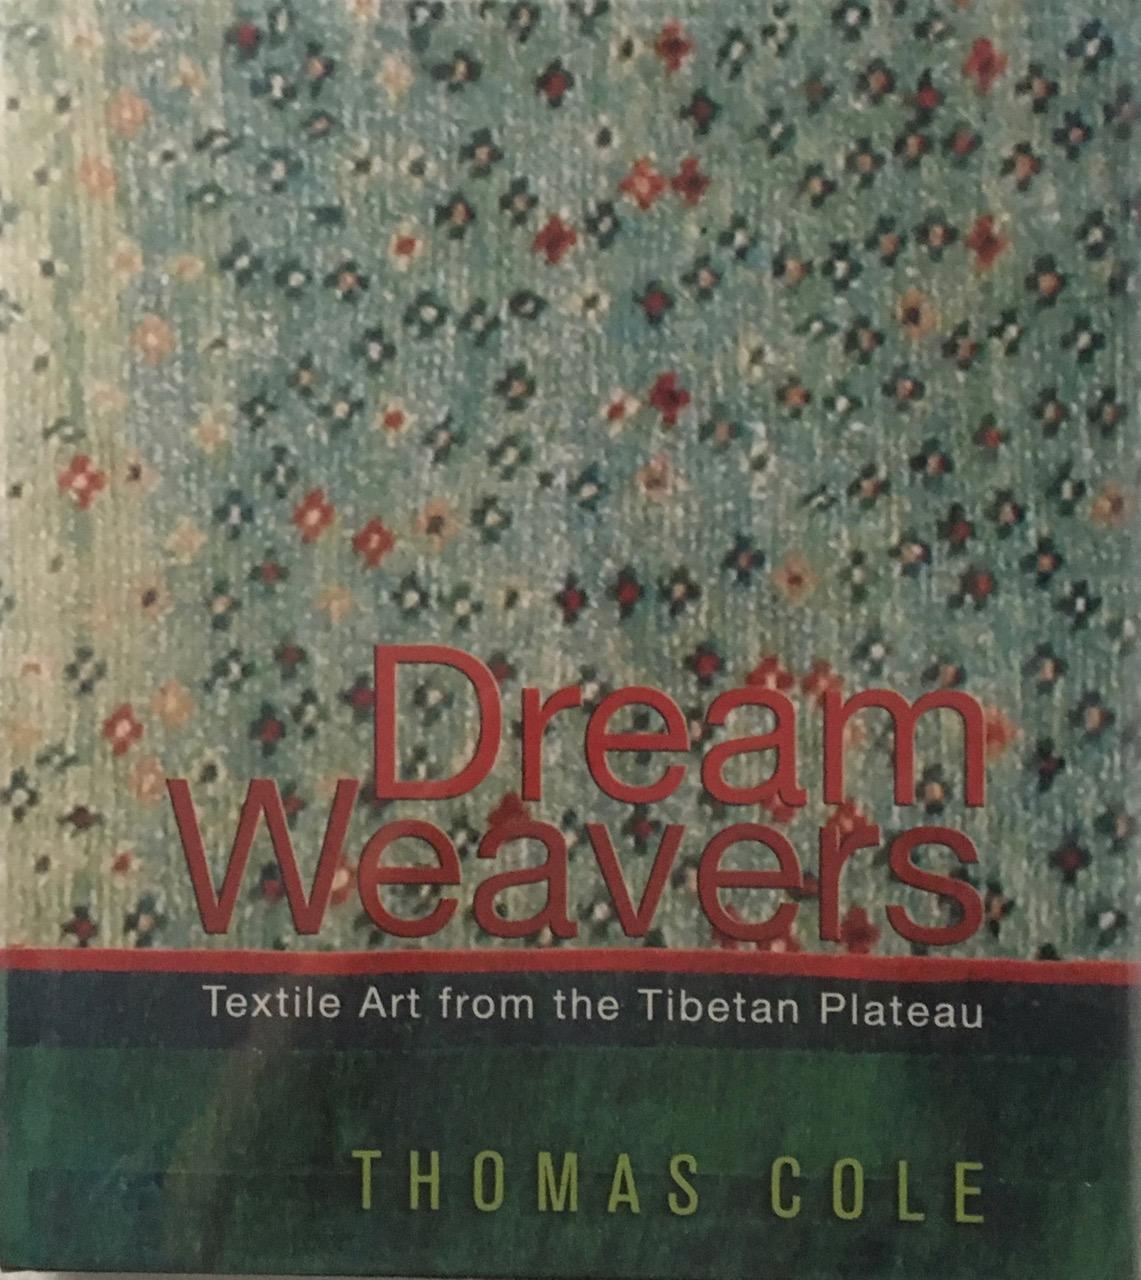 Dream Weavers: Textile Art from the Tibetan Plateau